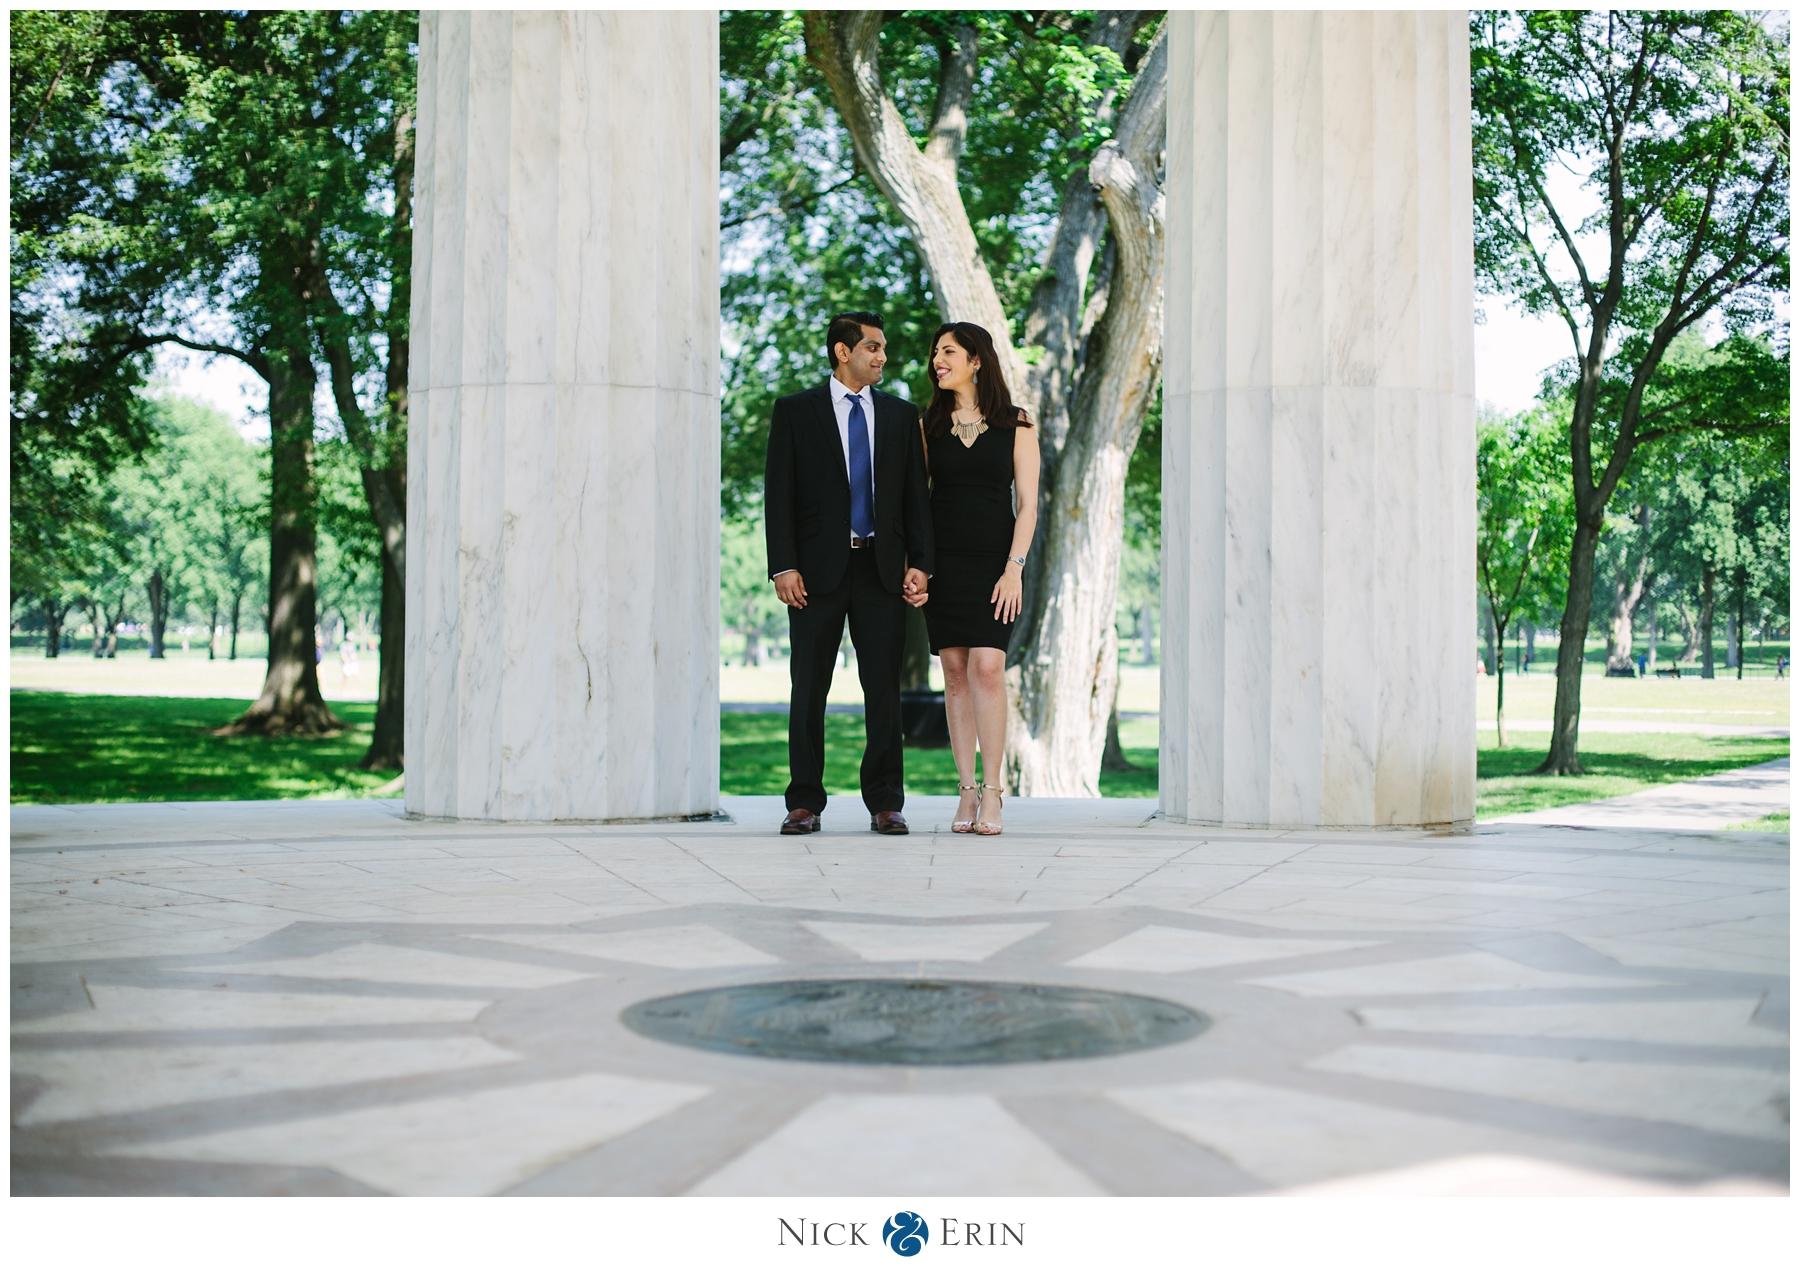 Donner_Photography_Washington DC Engagement_Bharti & Anadi_0008a